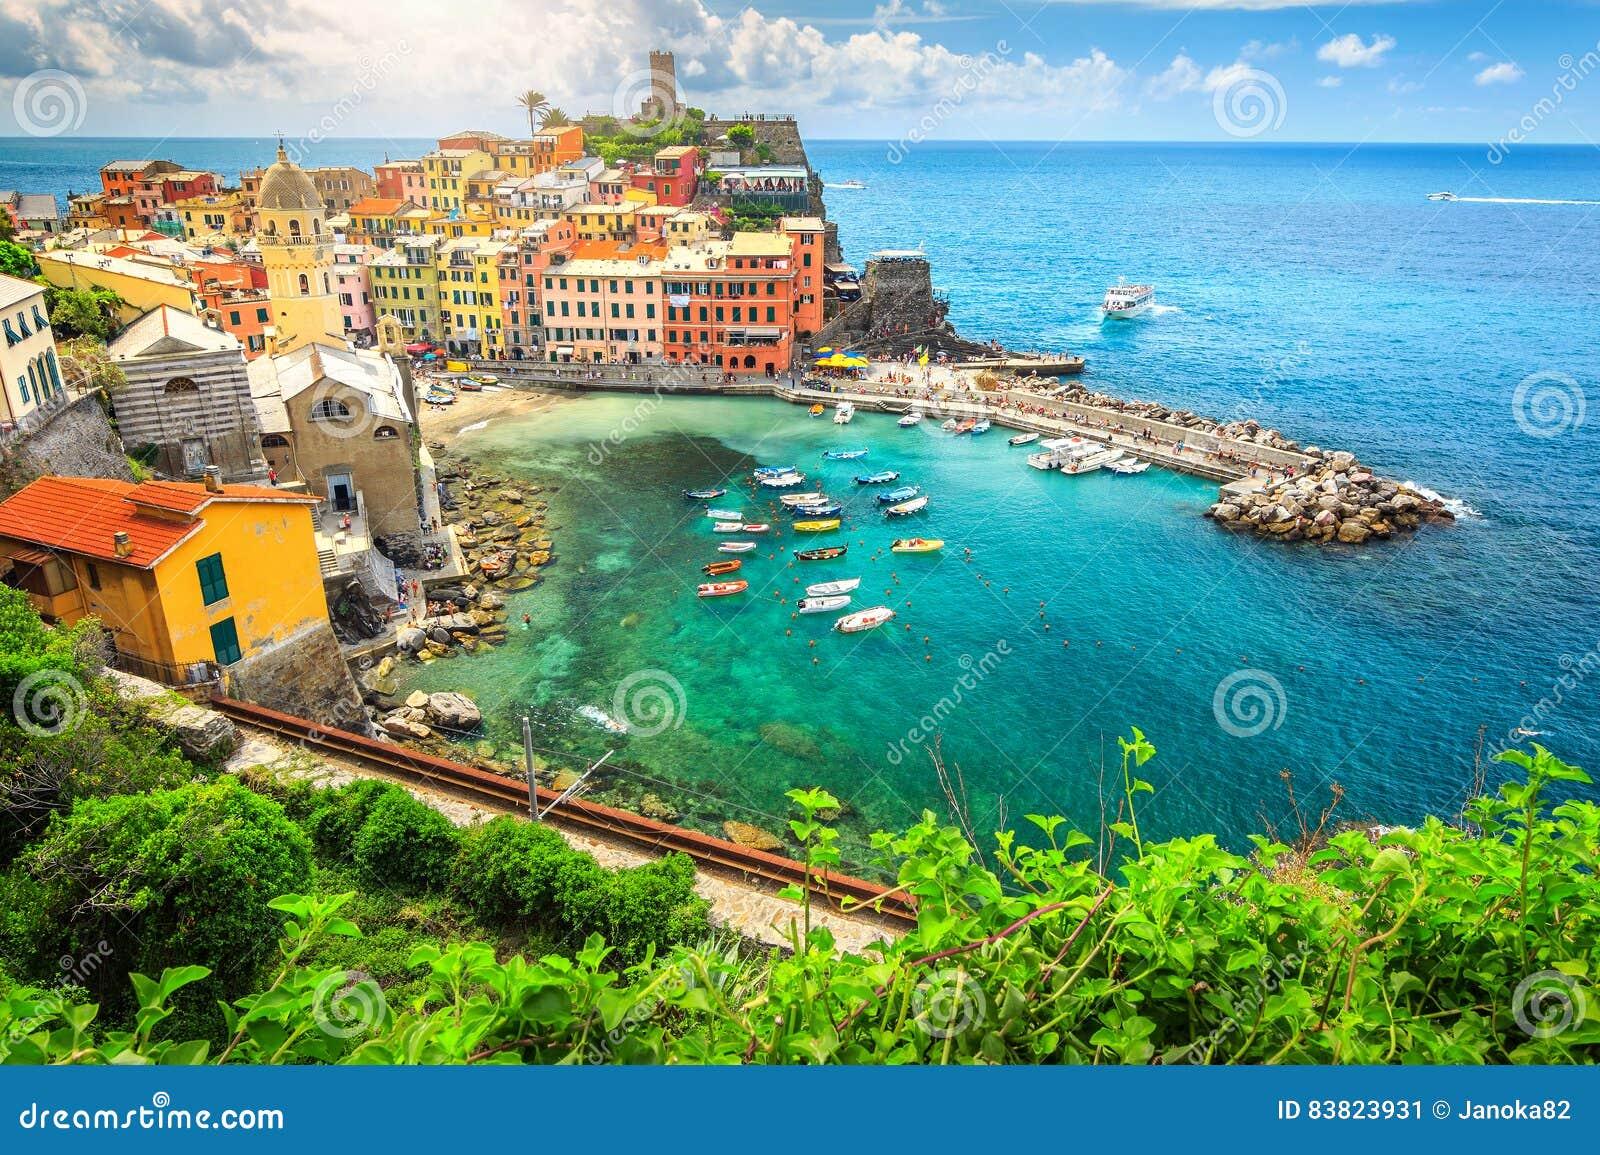 Amazing Vernazza Village And Stunning Sunrise, Cinque Terre, Italy ...